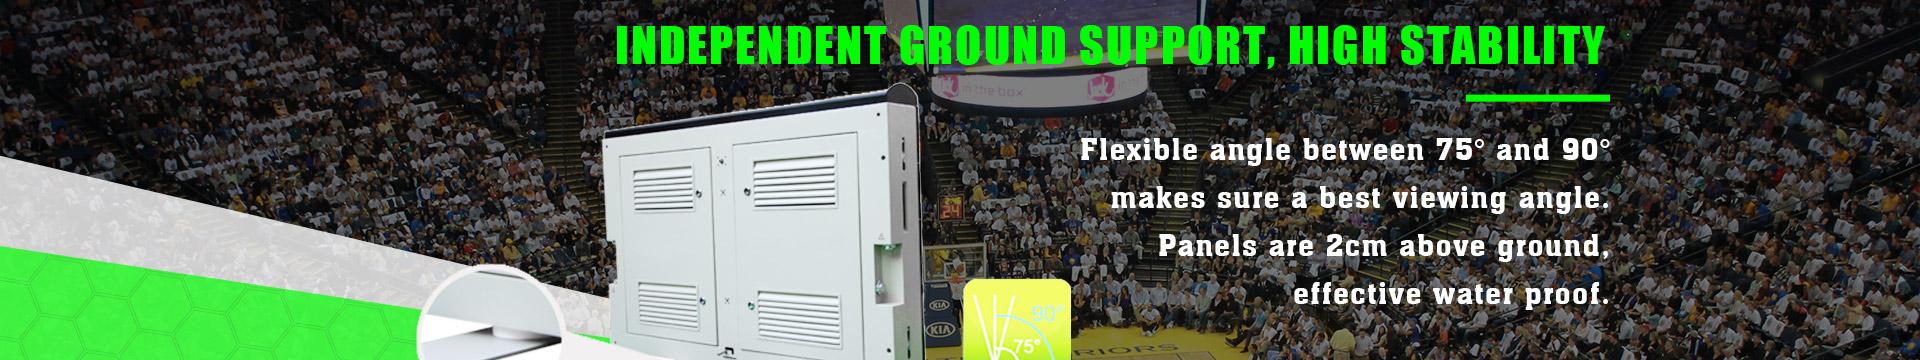 Independent Ground Support